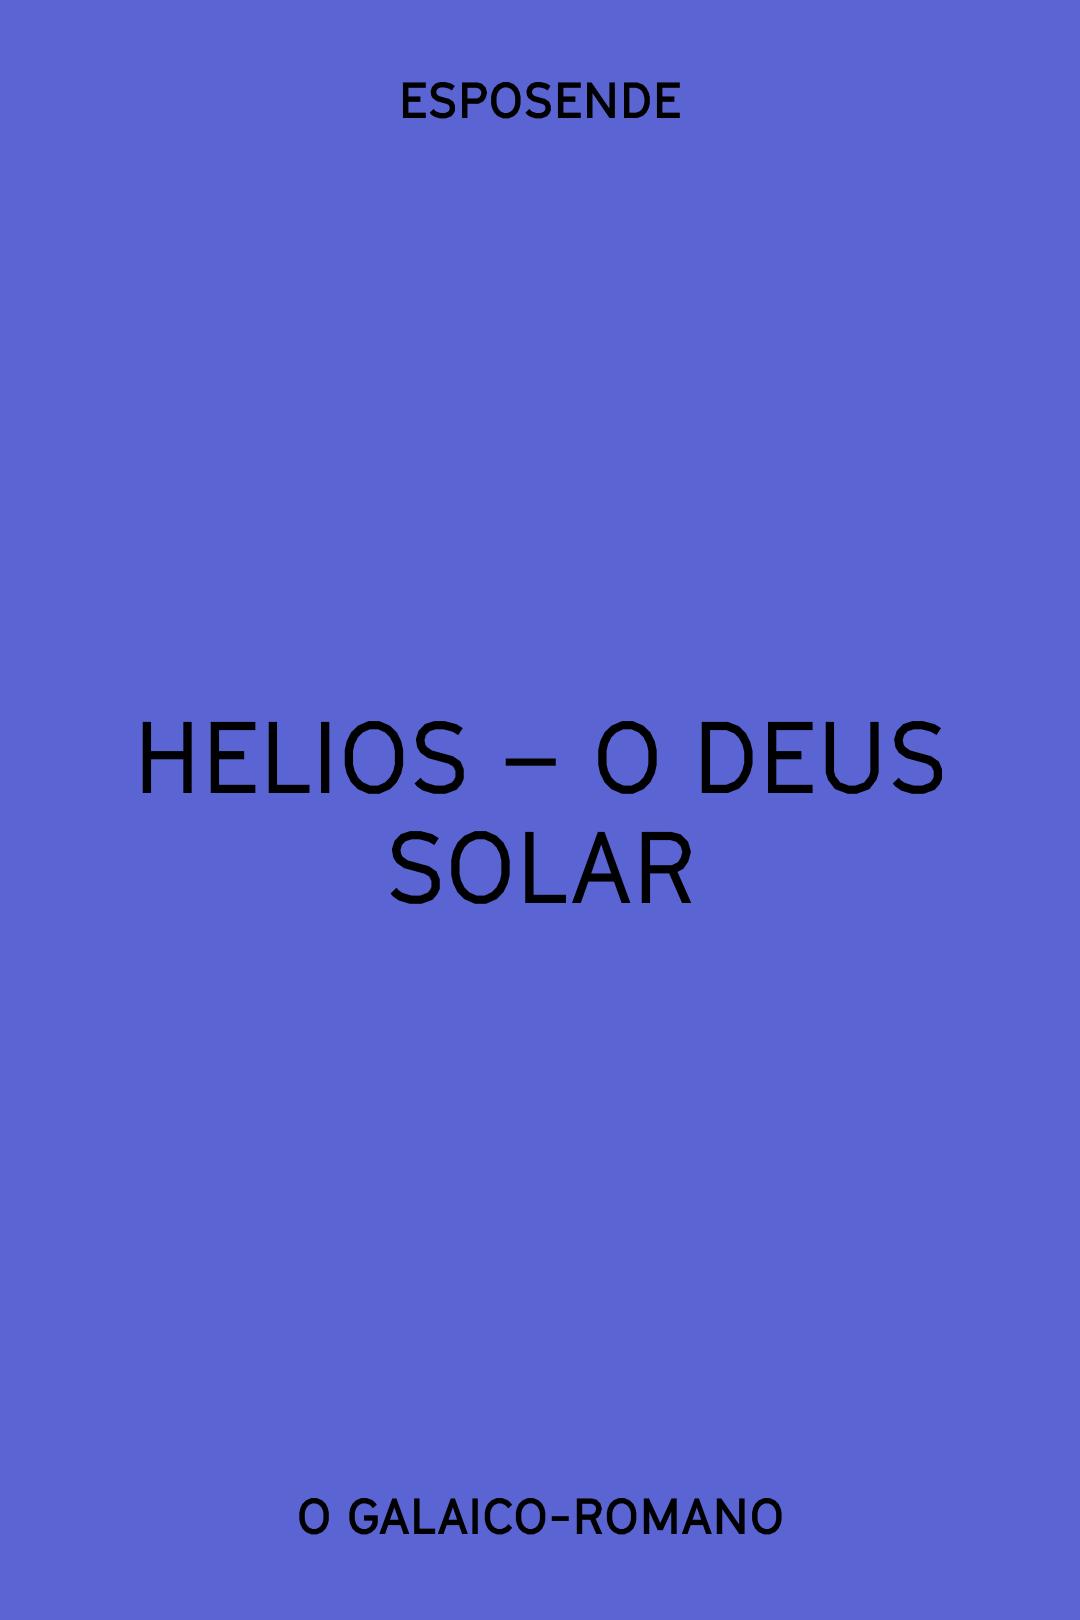 HELIOS - O DEUS SOLAR